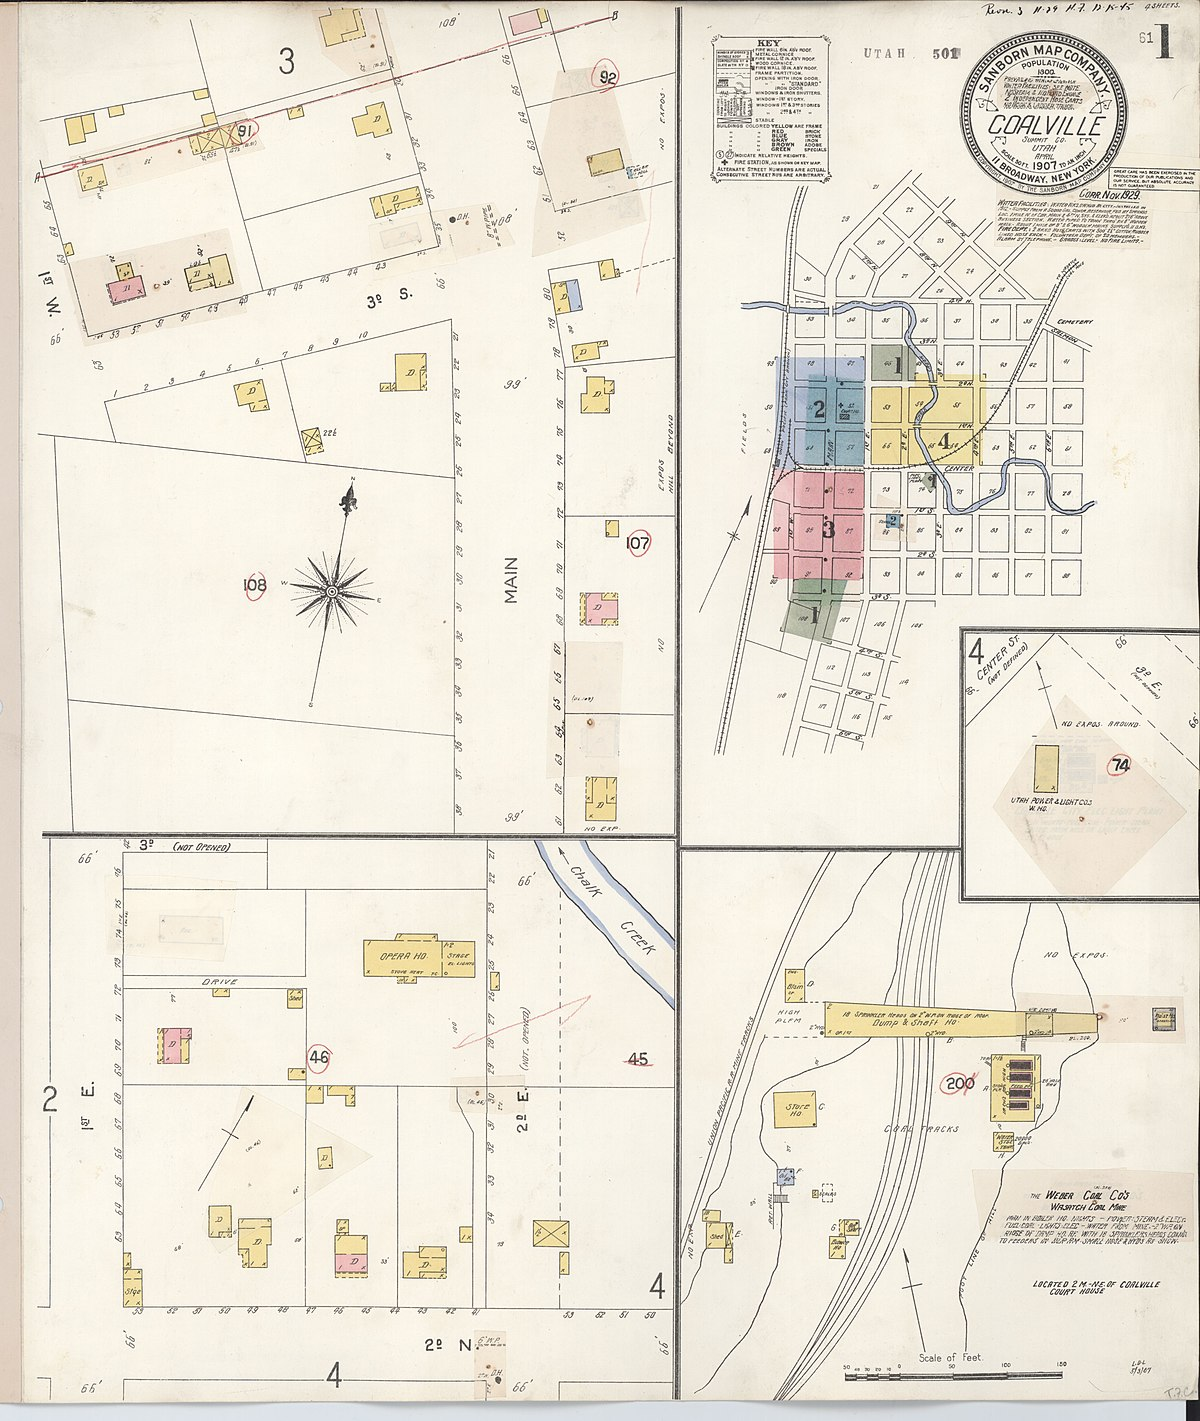 File:Sanborn Fire Insurance Map From Coalville, Summit